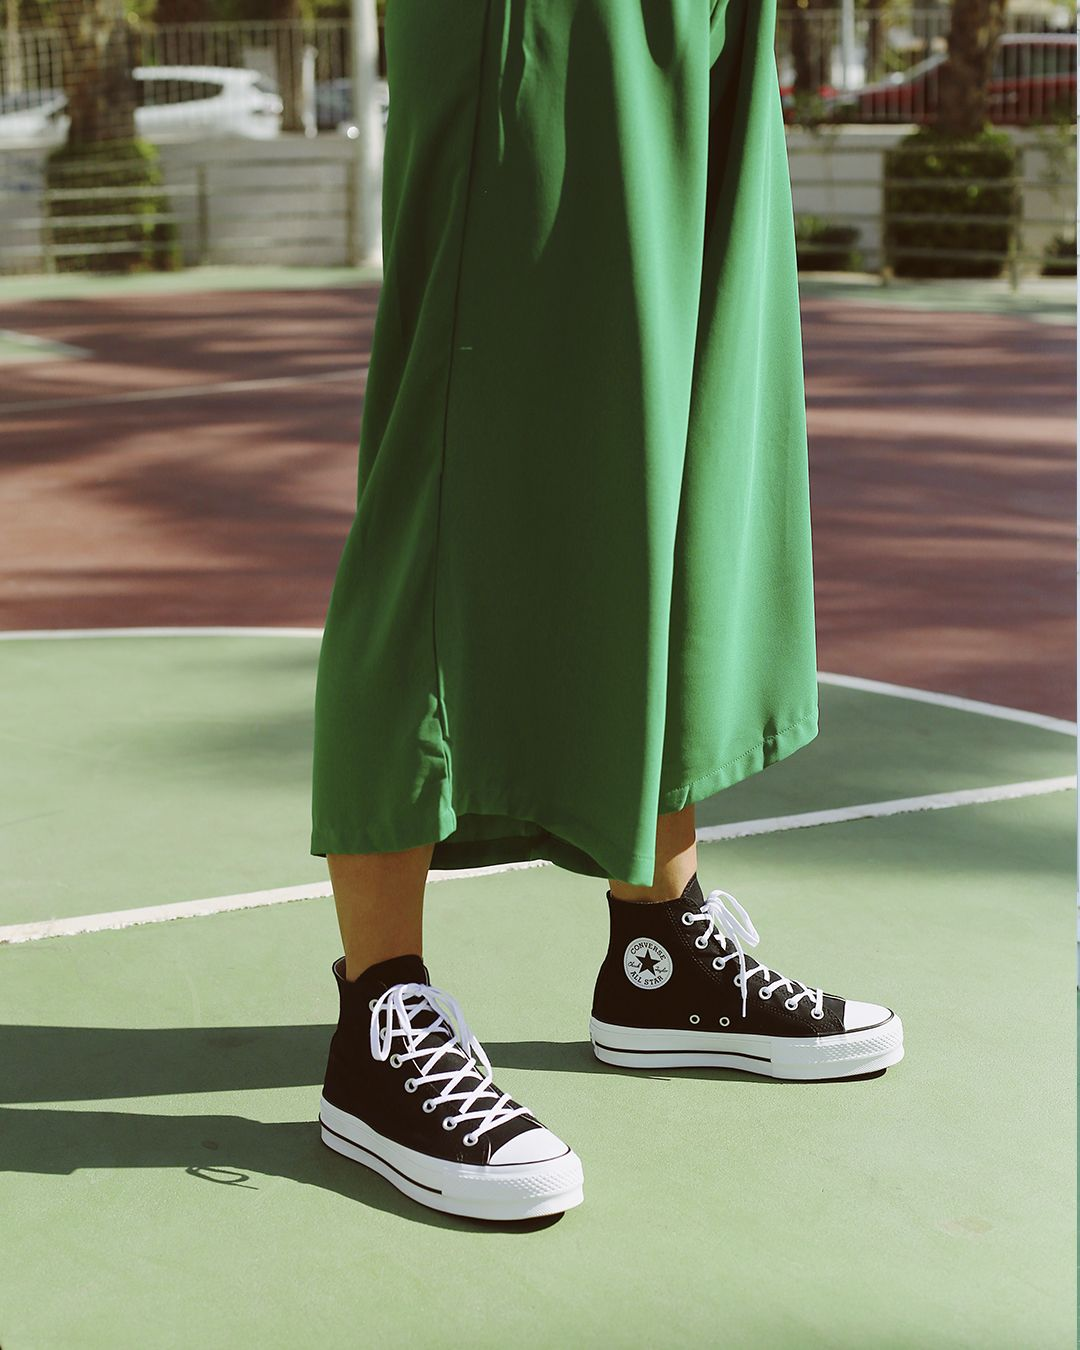 Estas Converse Con Plataforma Están Arrasando Black Converse Outfits High Top Converse Outfits Outfits With Converse